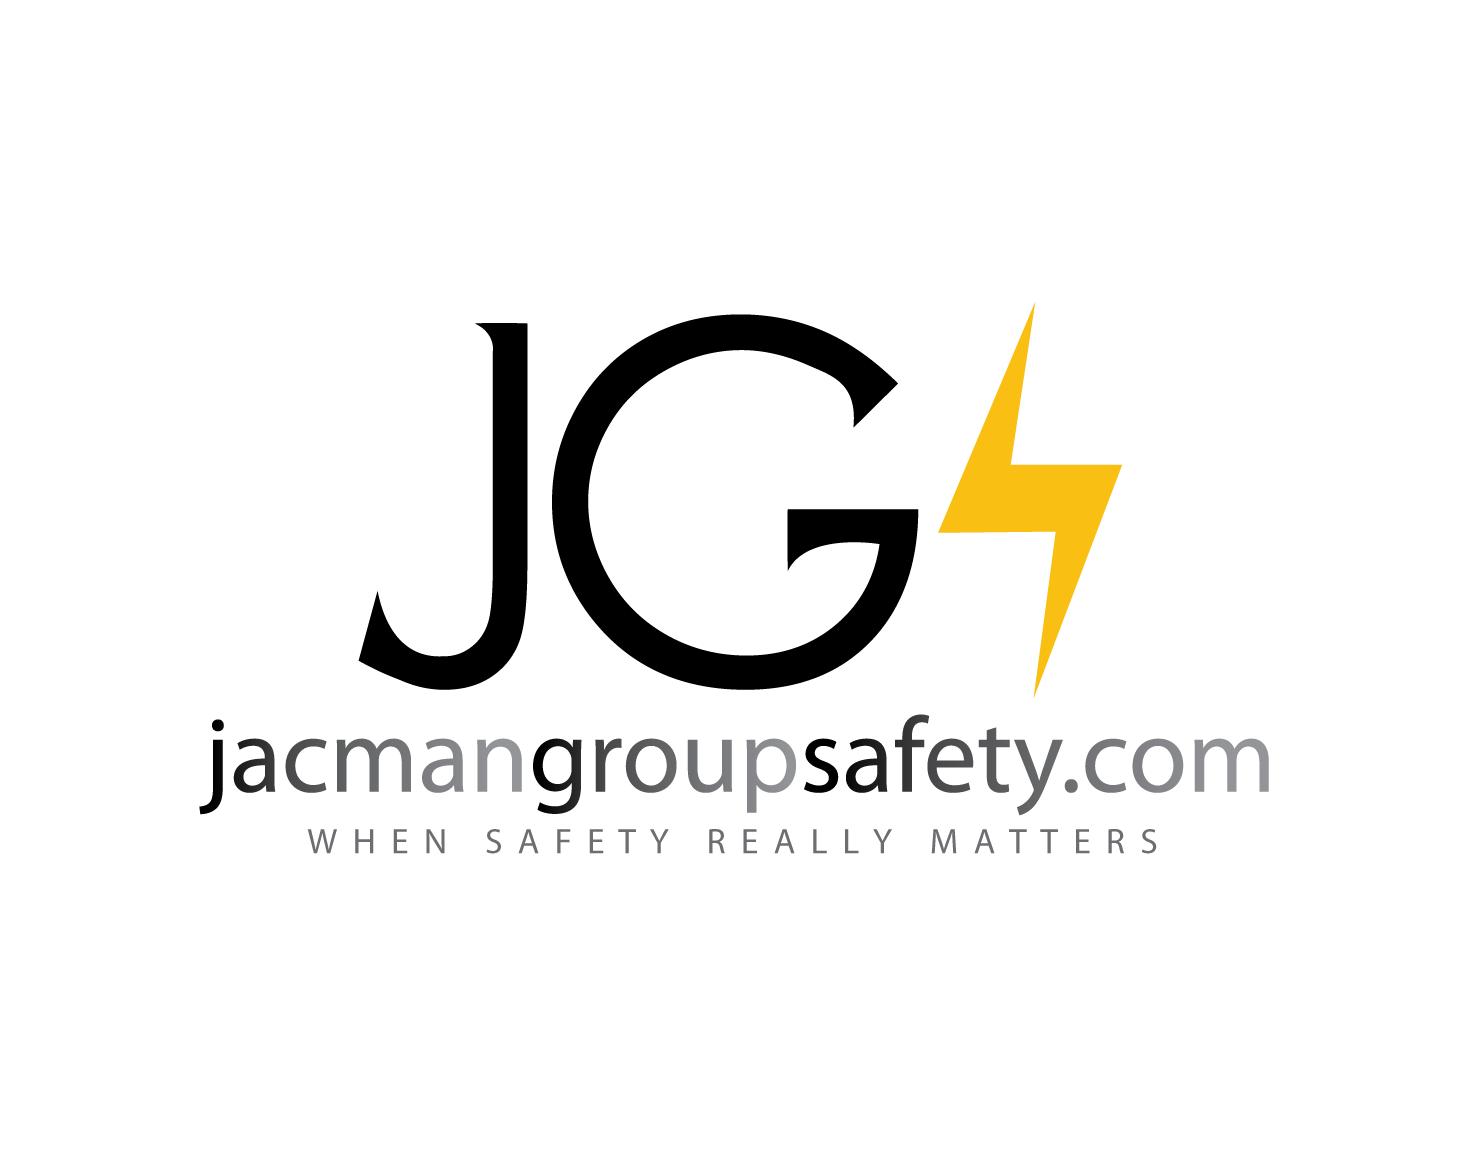 Logo Design by Roy Ferre - Entry No. 152 in the Logo Design Contest The Jacman Group Logo Design.